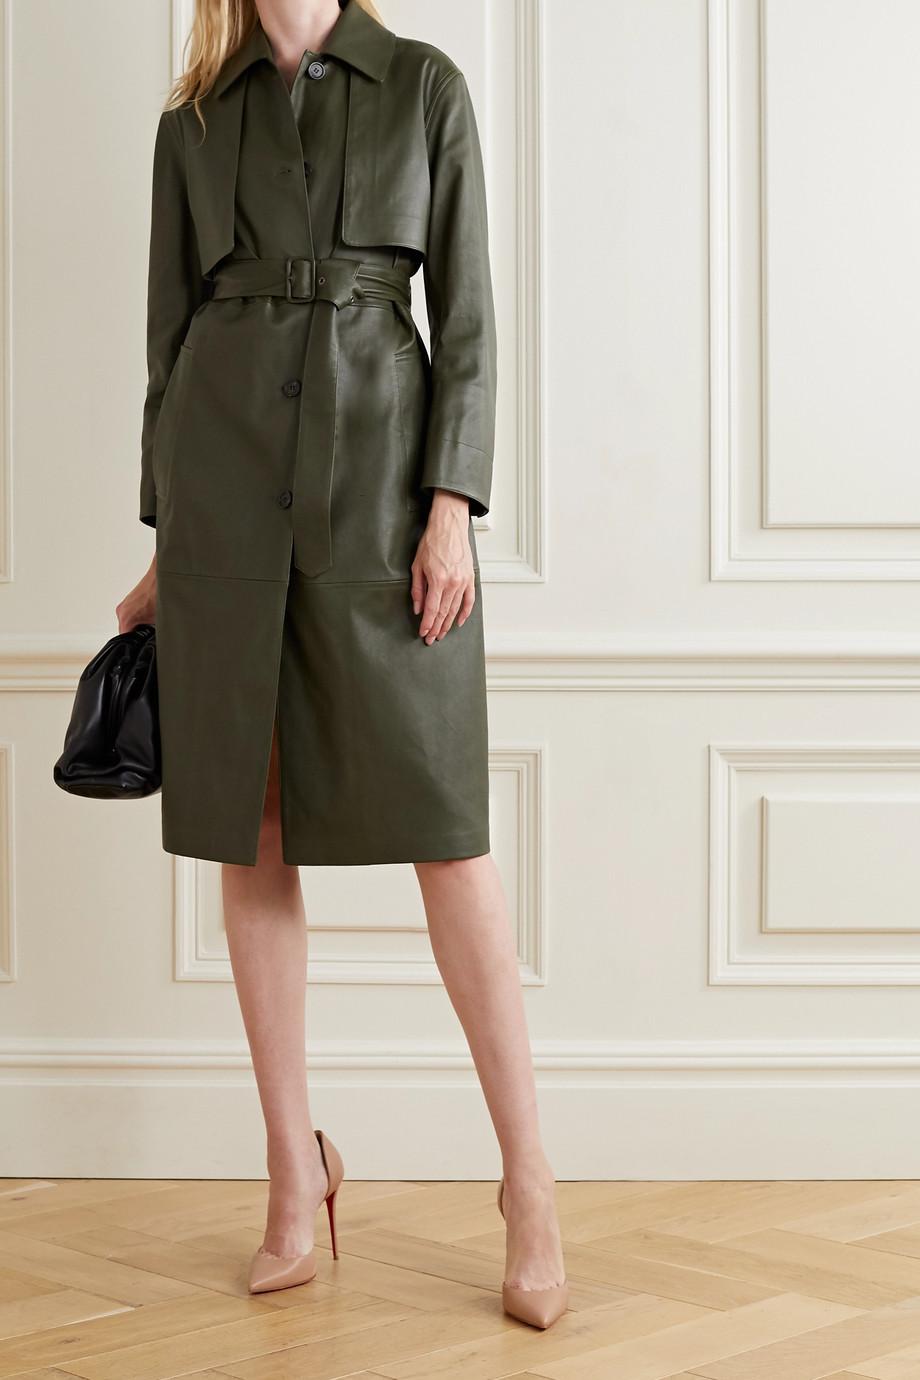 Salvatore Ferragamo Paneled leather trench coat